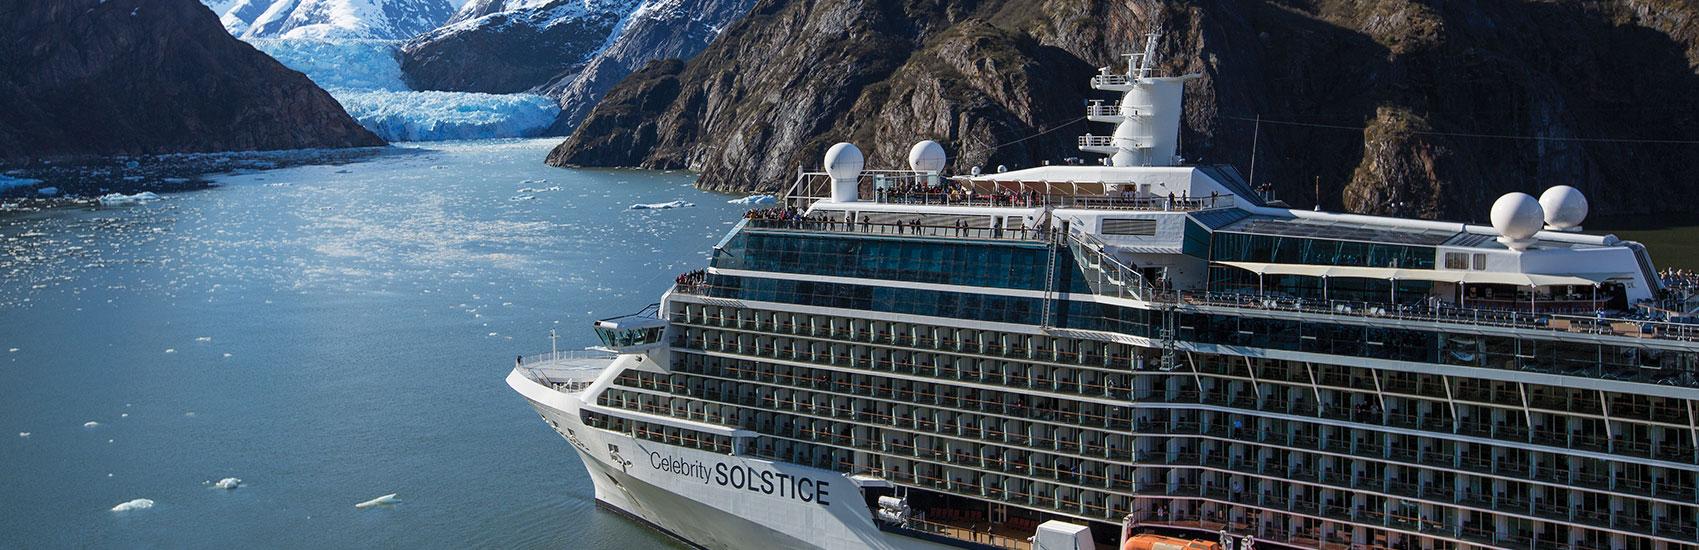 Back to Alaska with Celebrity Cruises